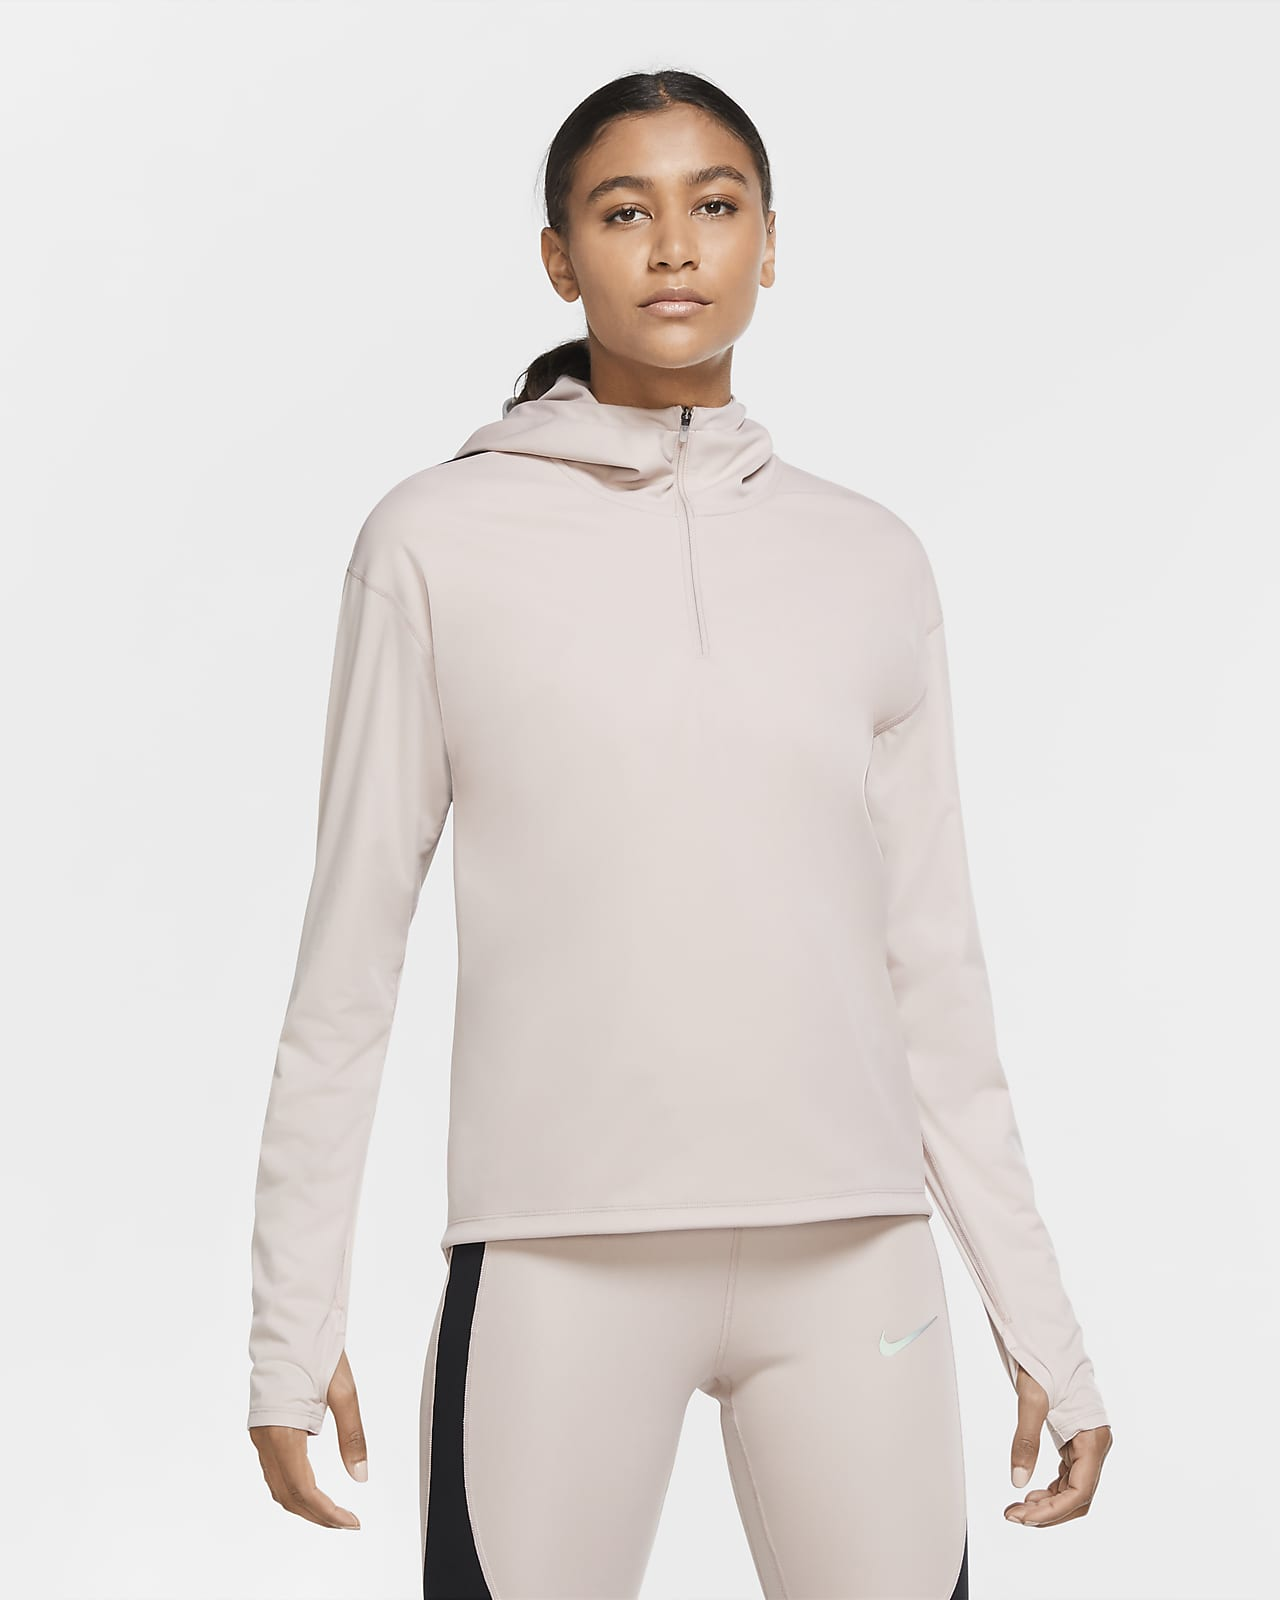 Camiseta de running para mujer Nike Shield Run Division